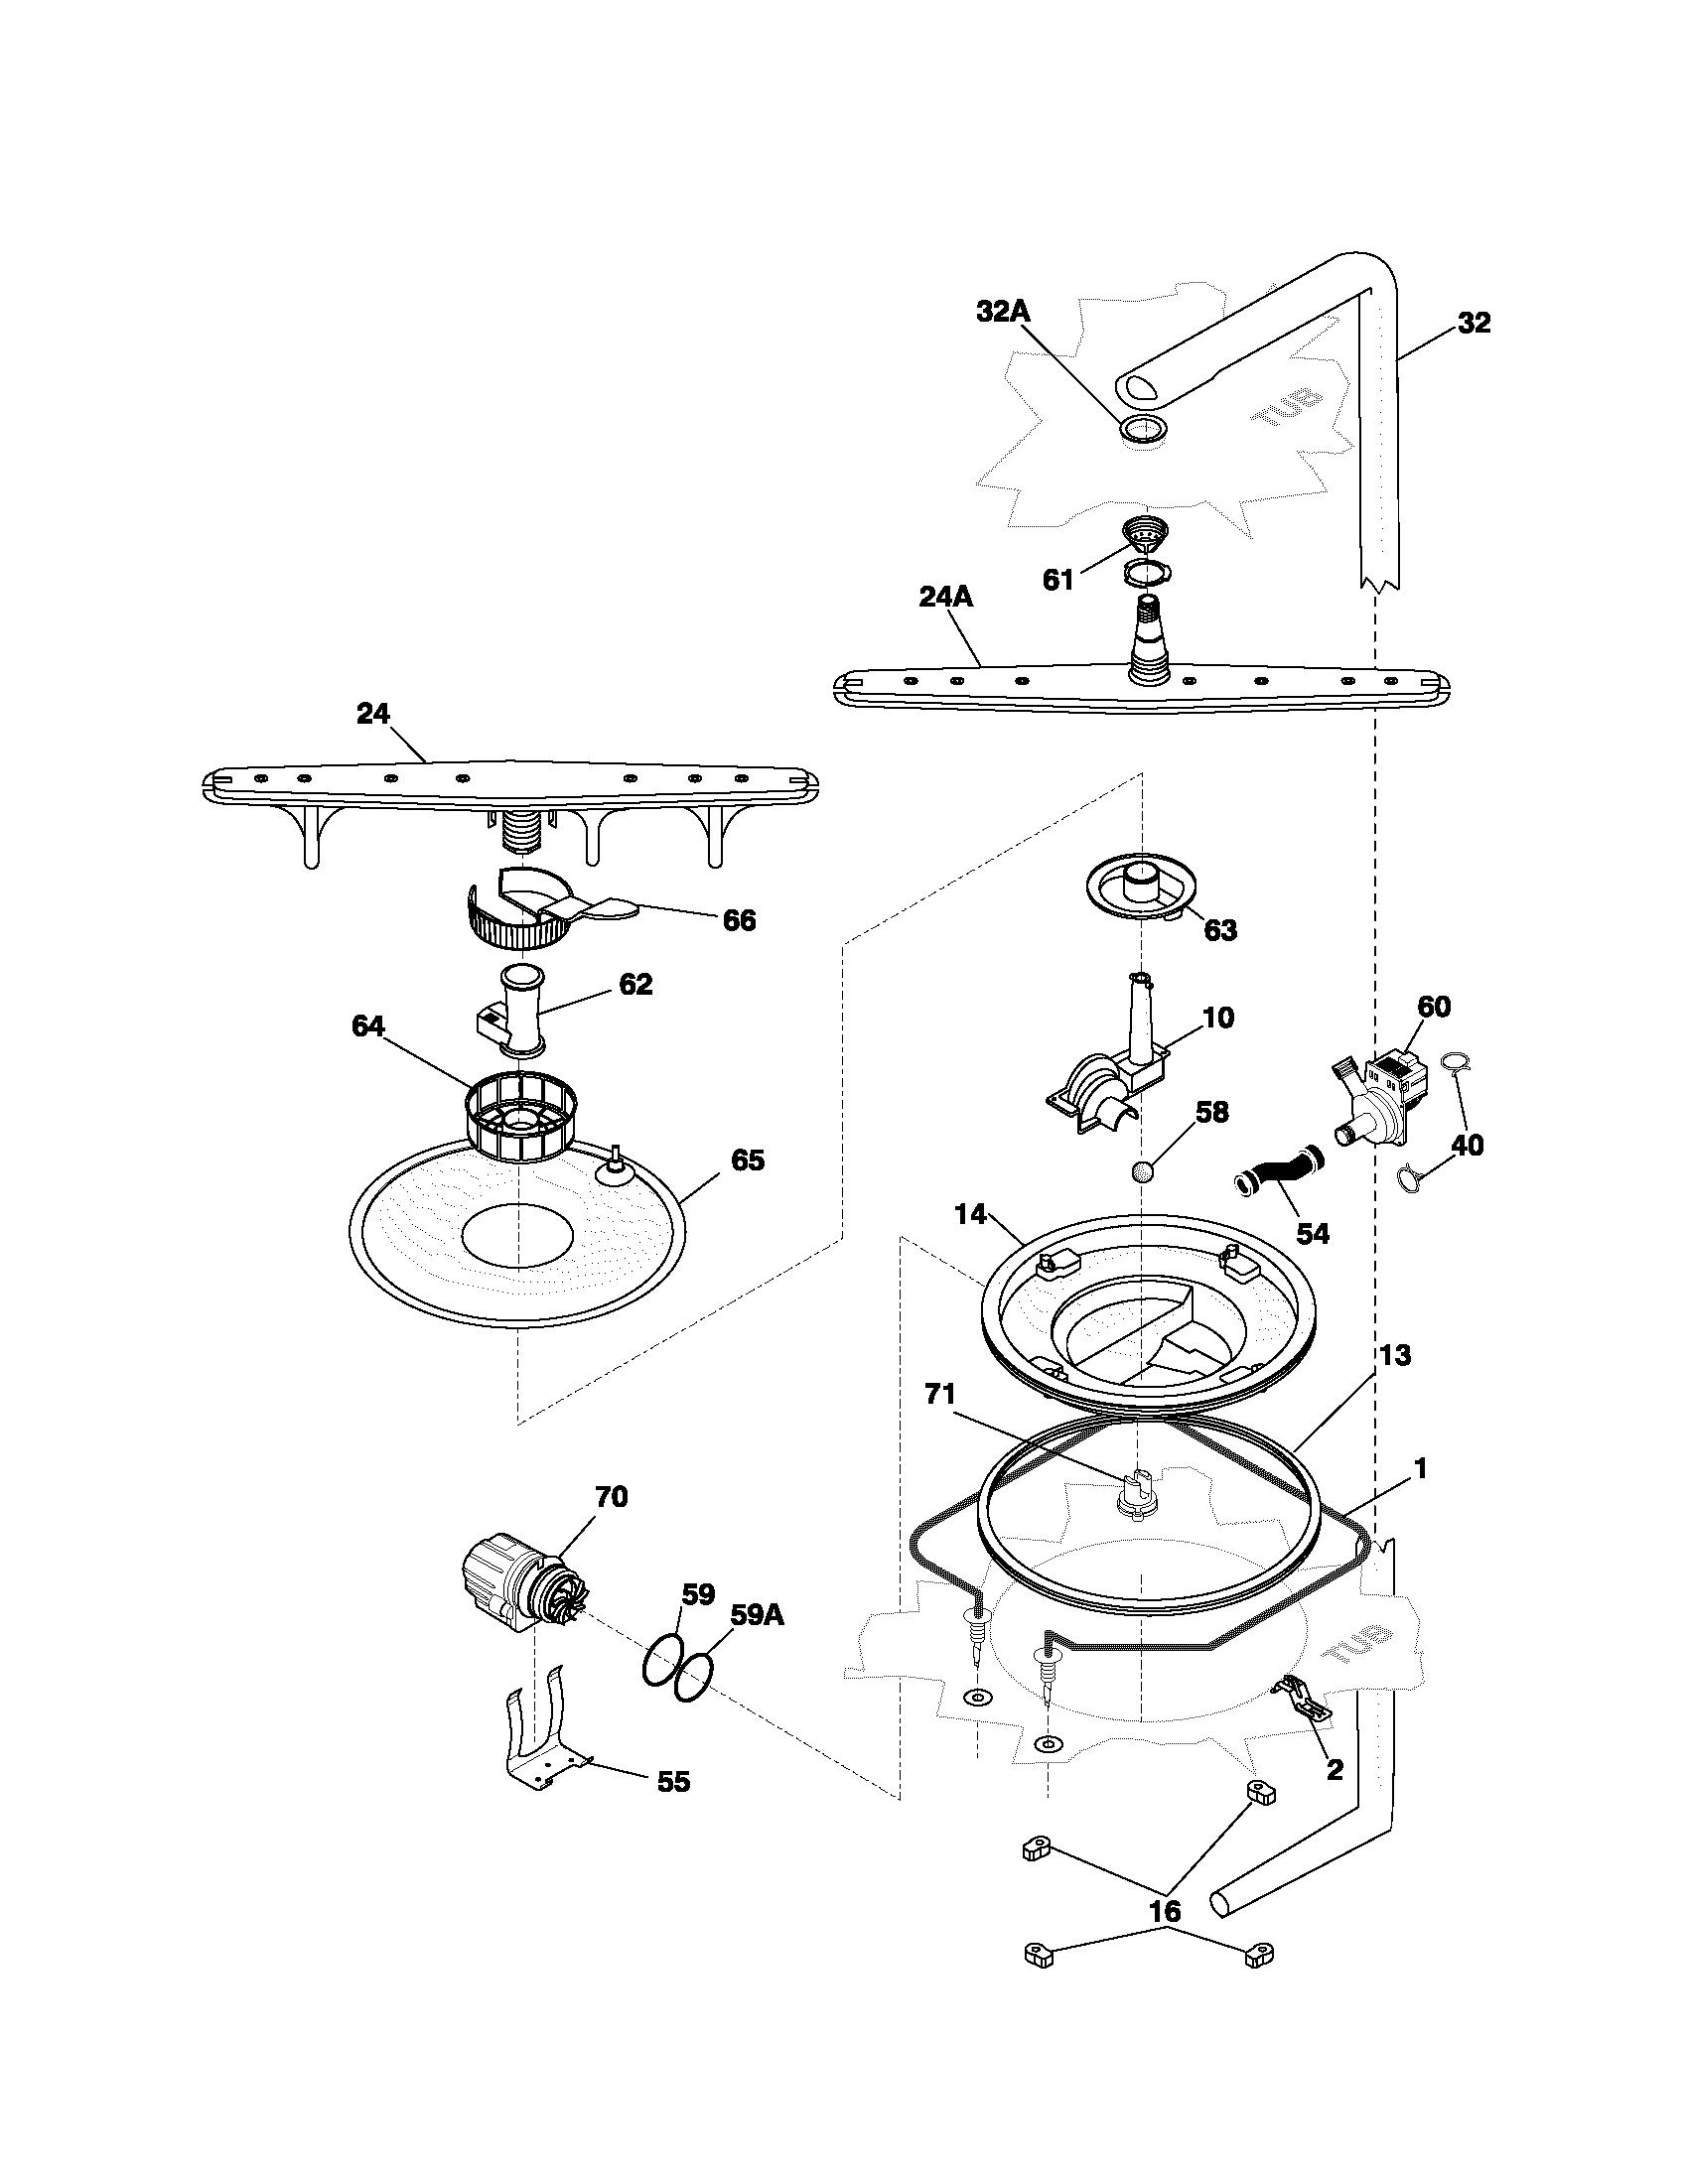 hight resolution of frigidaire dishwasher hose diagram wiring diagrams frigidaire dishwasher hose diagram